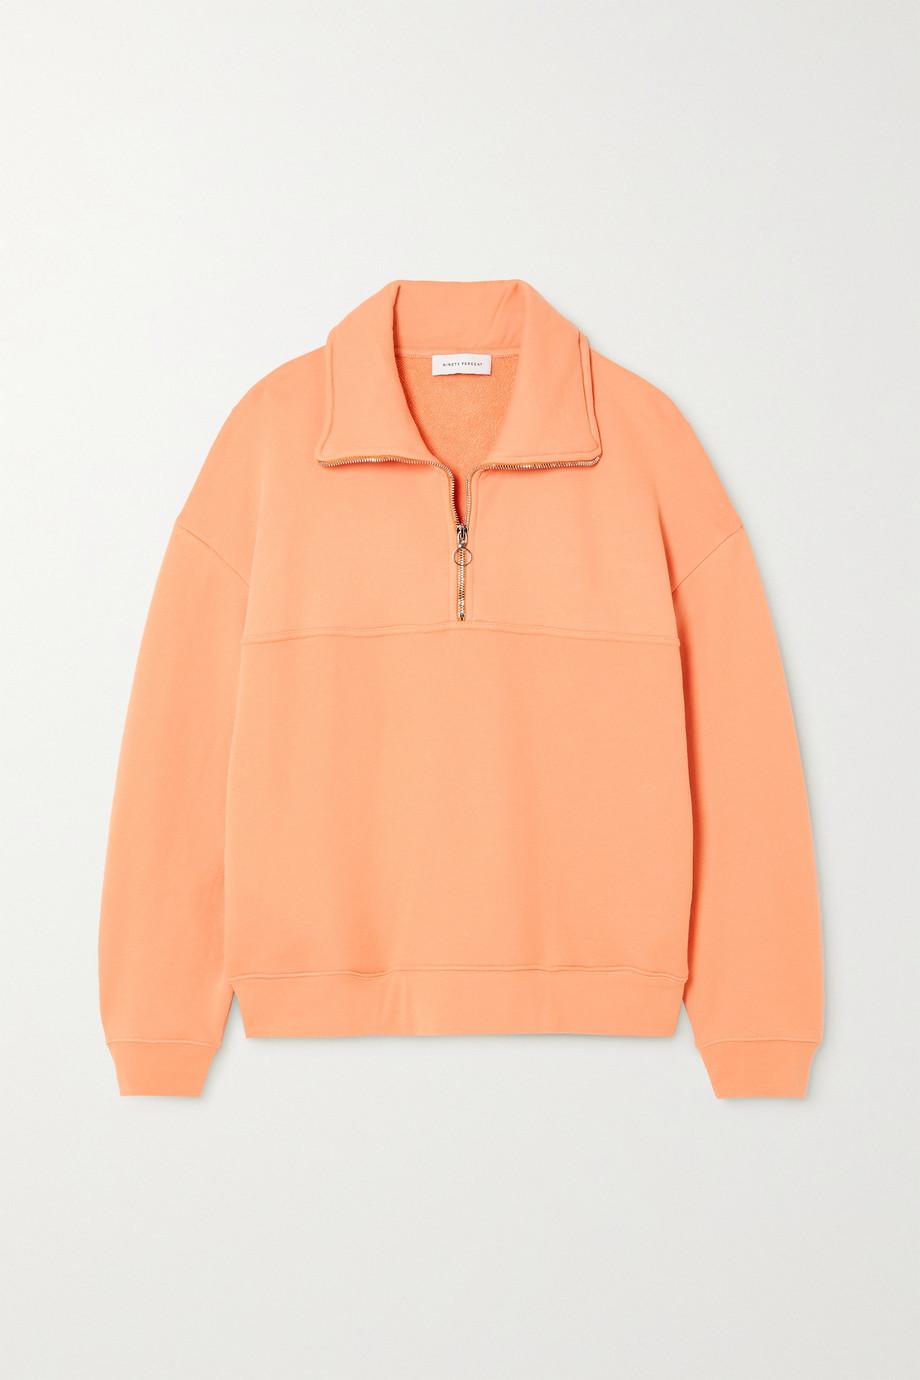 Ninety Percent + NET SUSTAIN Sweatshirt aus Biobaumwoll-Jersey